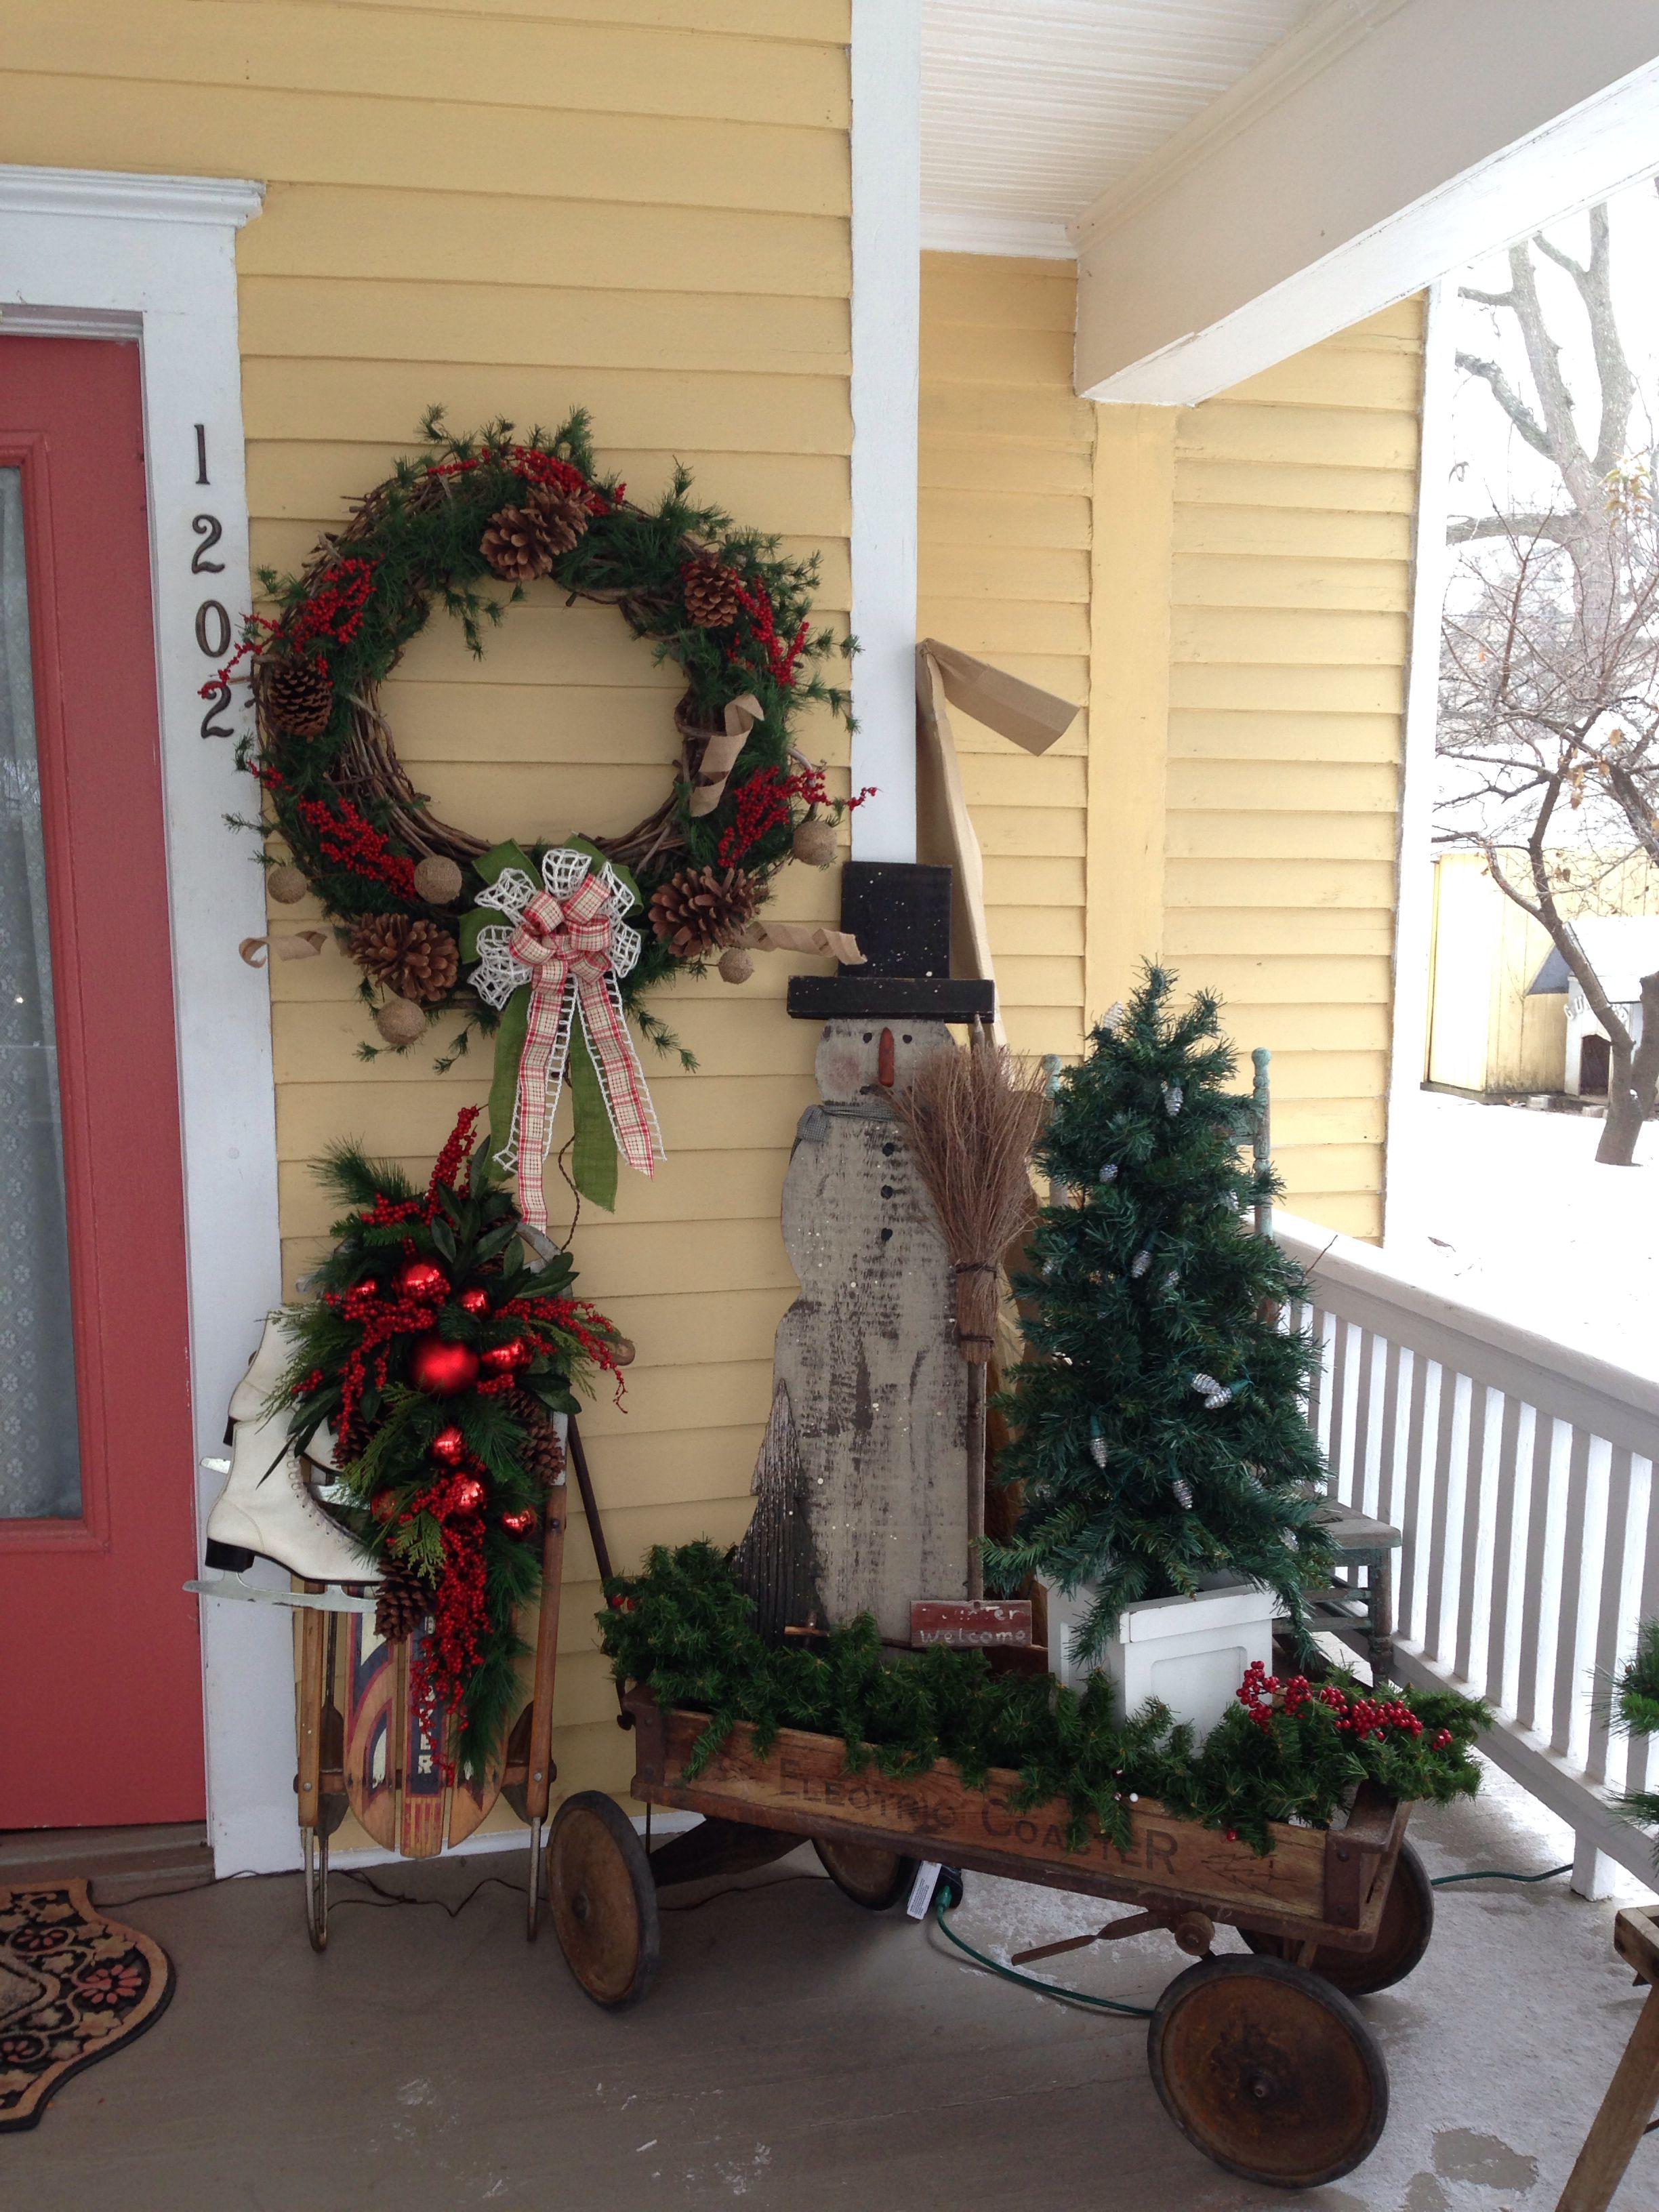 my primitive christmas porch decor the wreath is my favorite part - Primitive Christmas Porch Decor